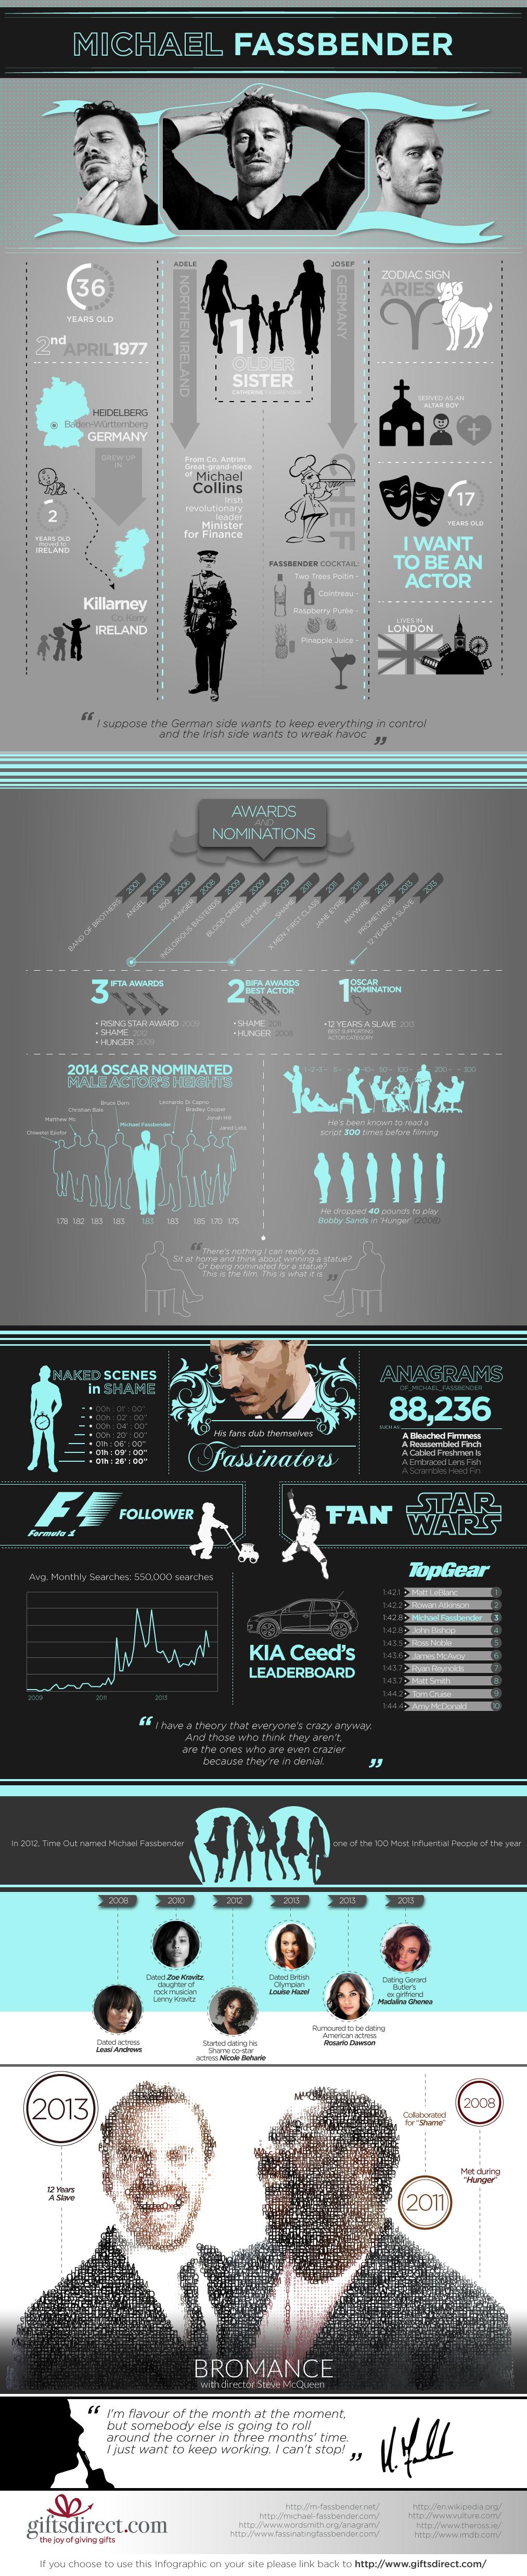 Infographic-Michael-Fassbender